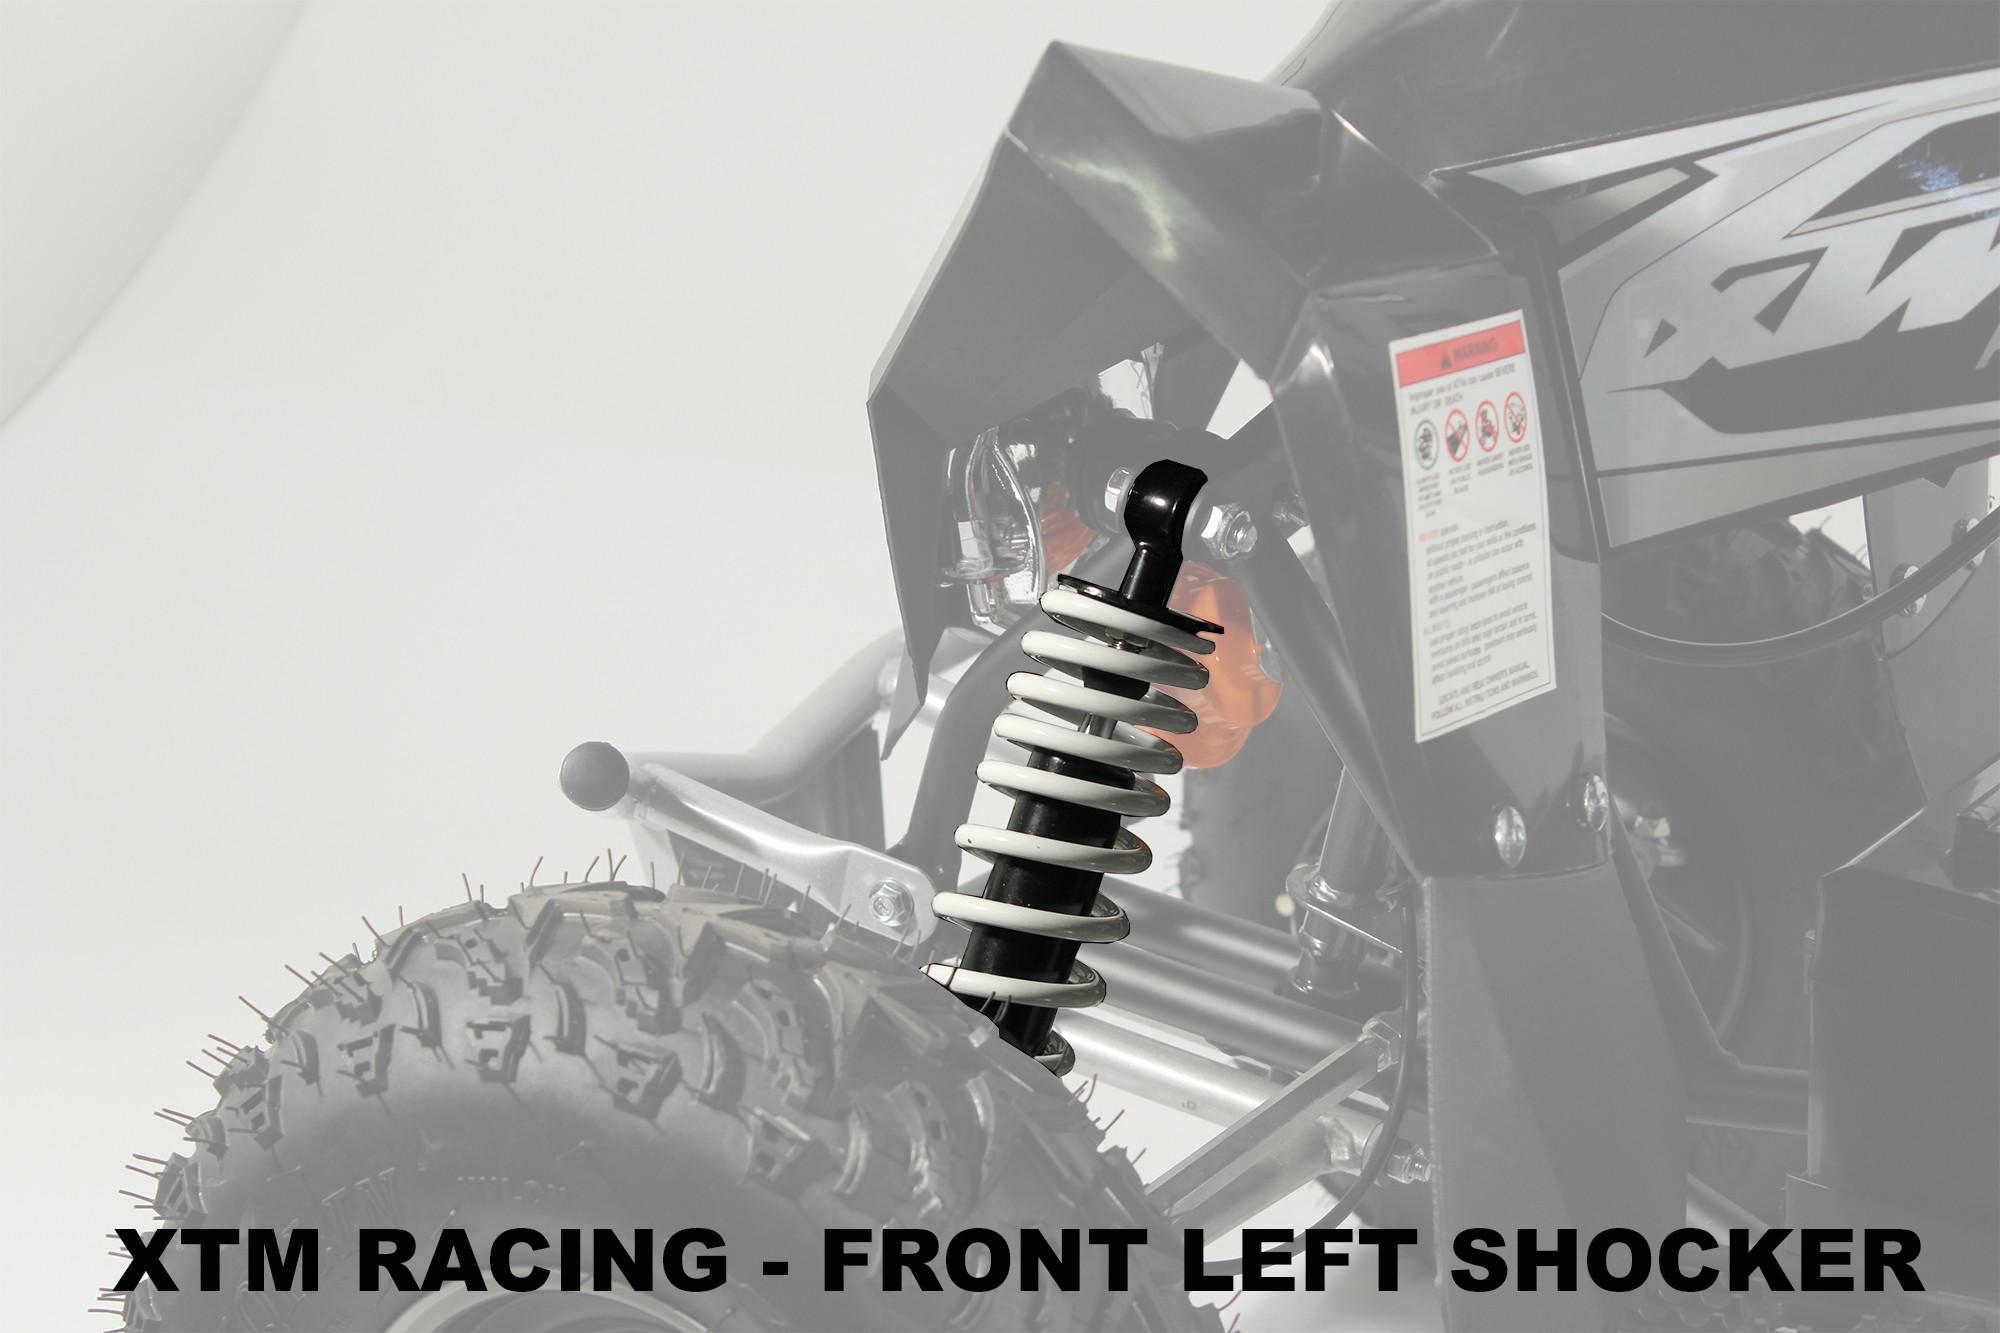 XTM RACING QUAD COMPLETE NEAR SIDE FRONT LEFT SHOCKER